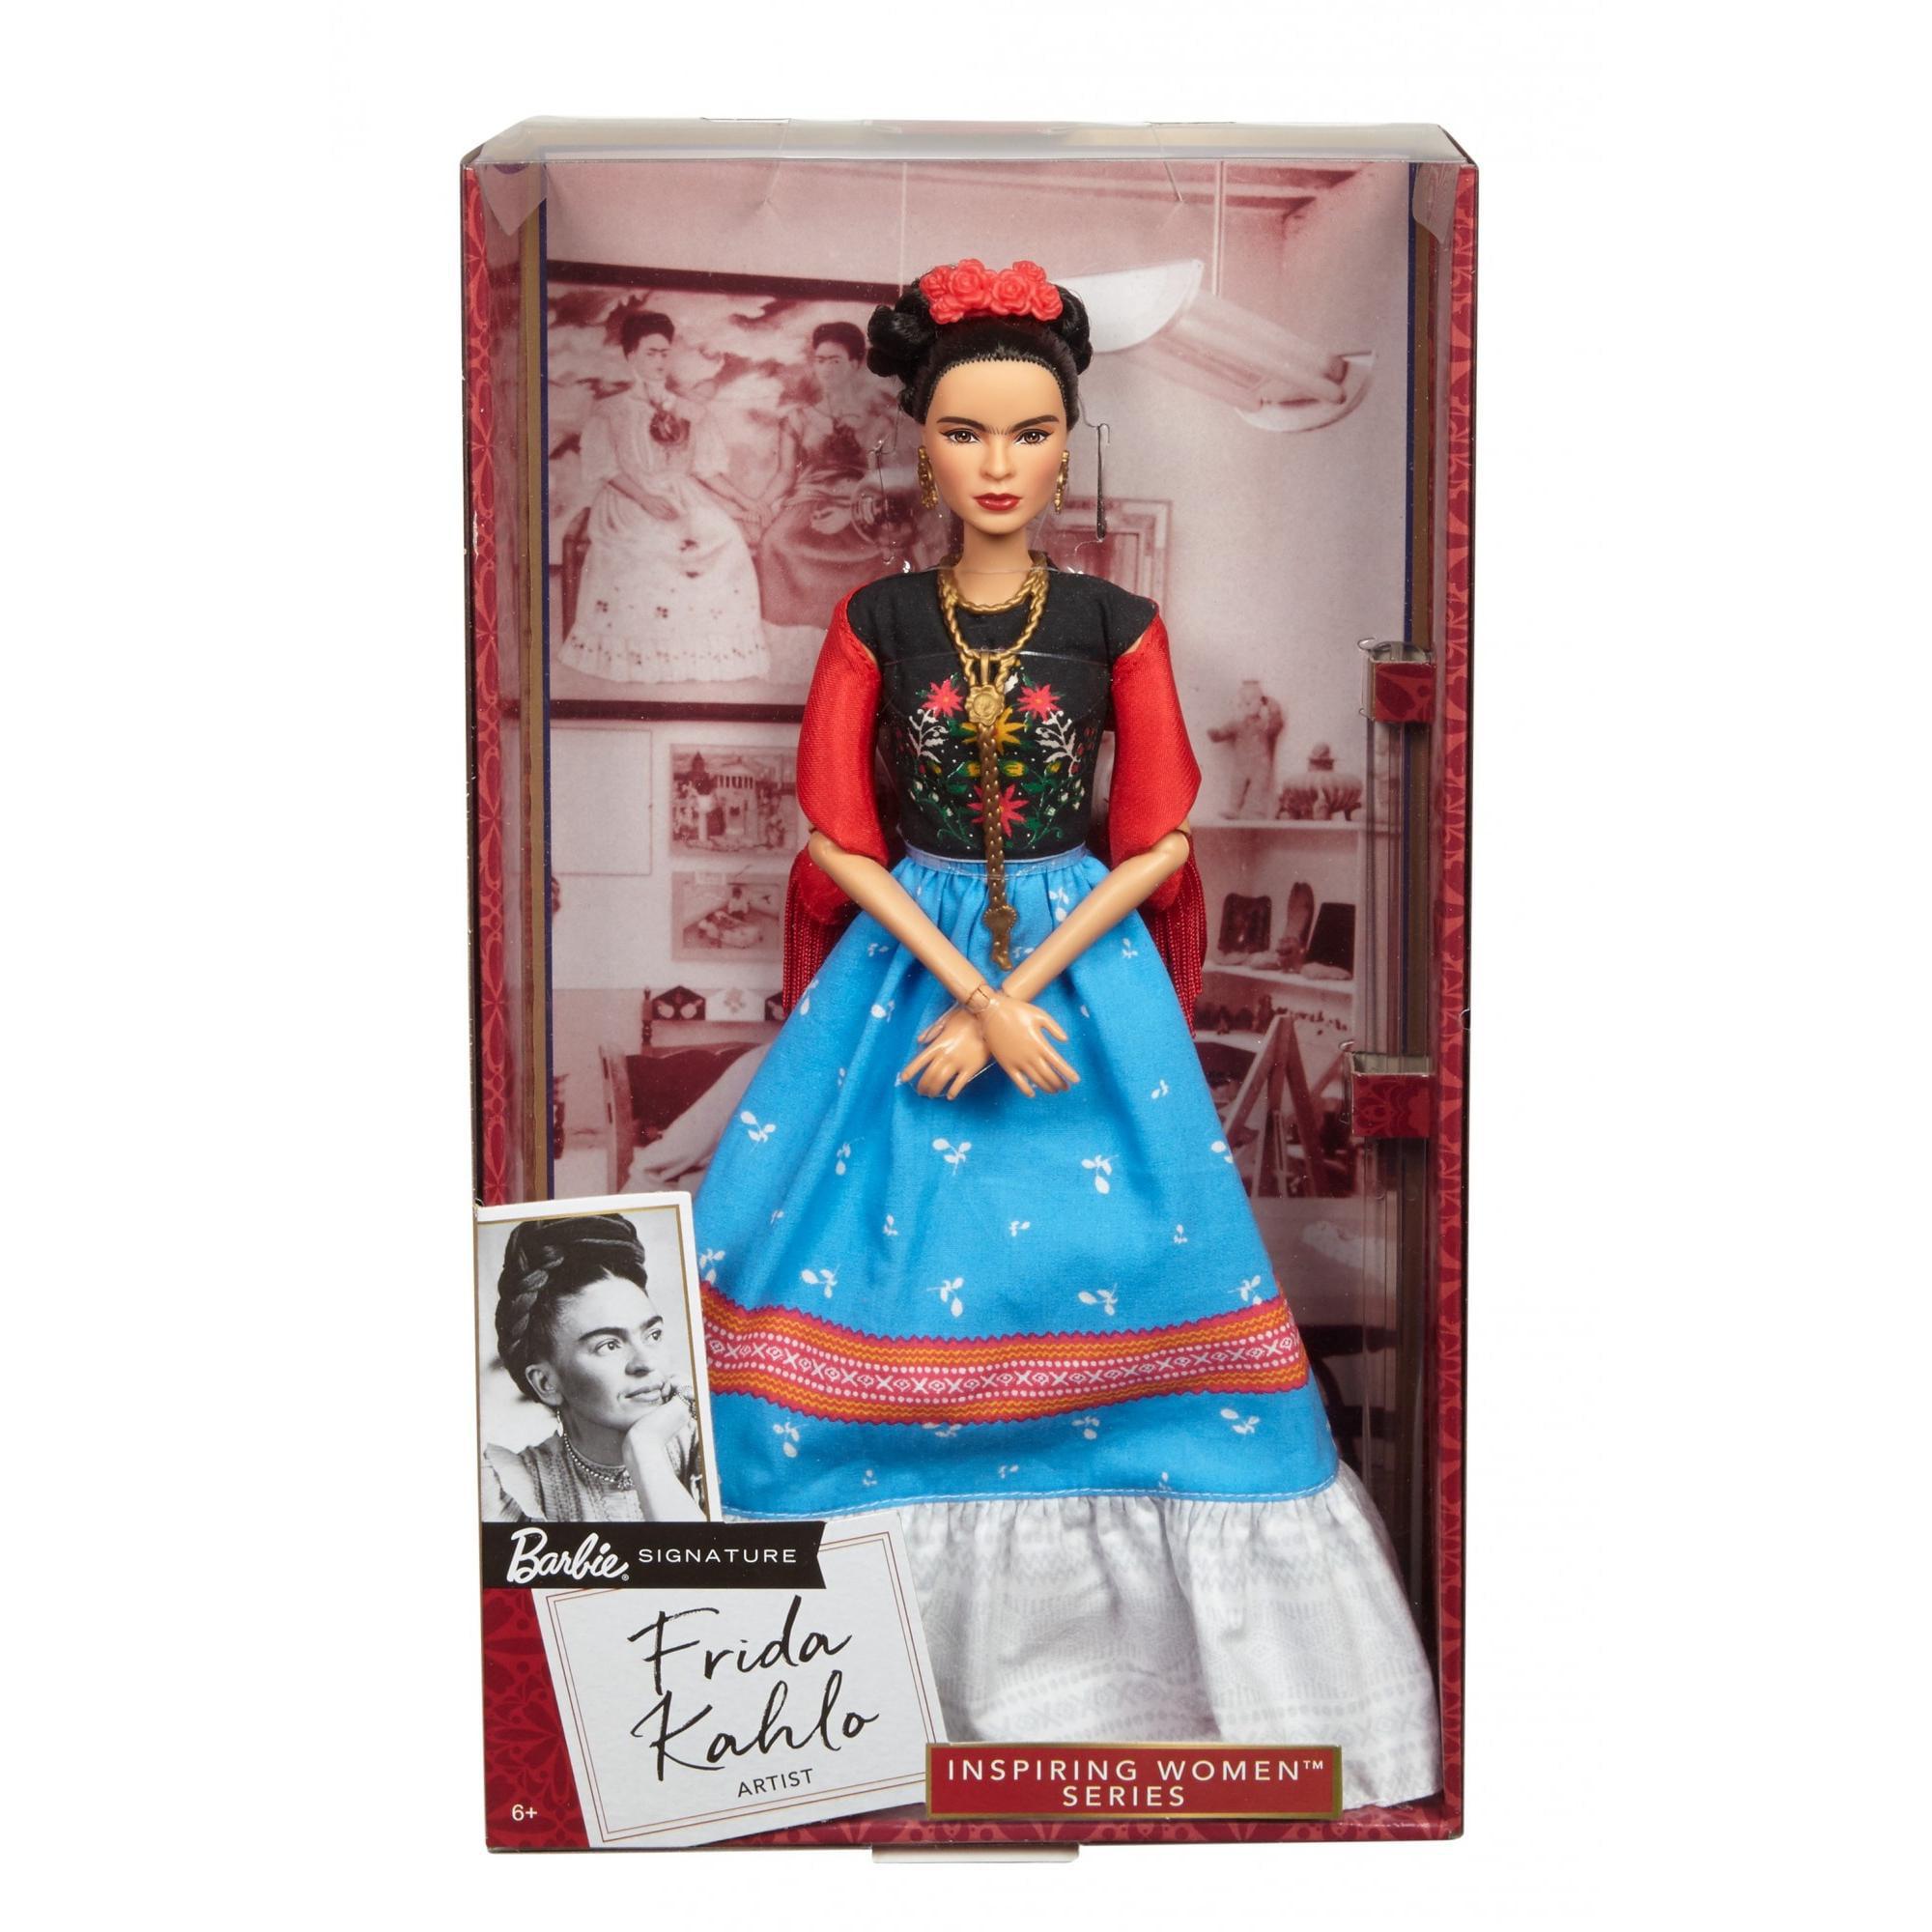 Barbie Inspiring Women Series Frida Kahlo Doll Walmart